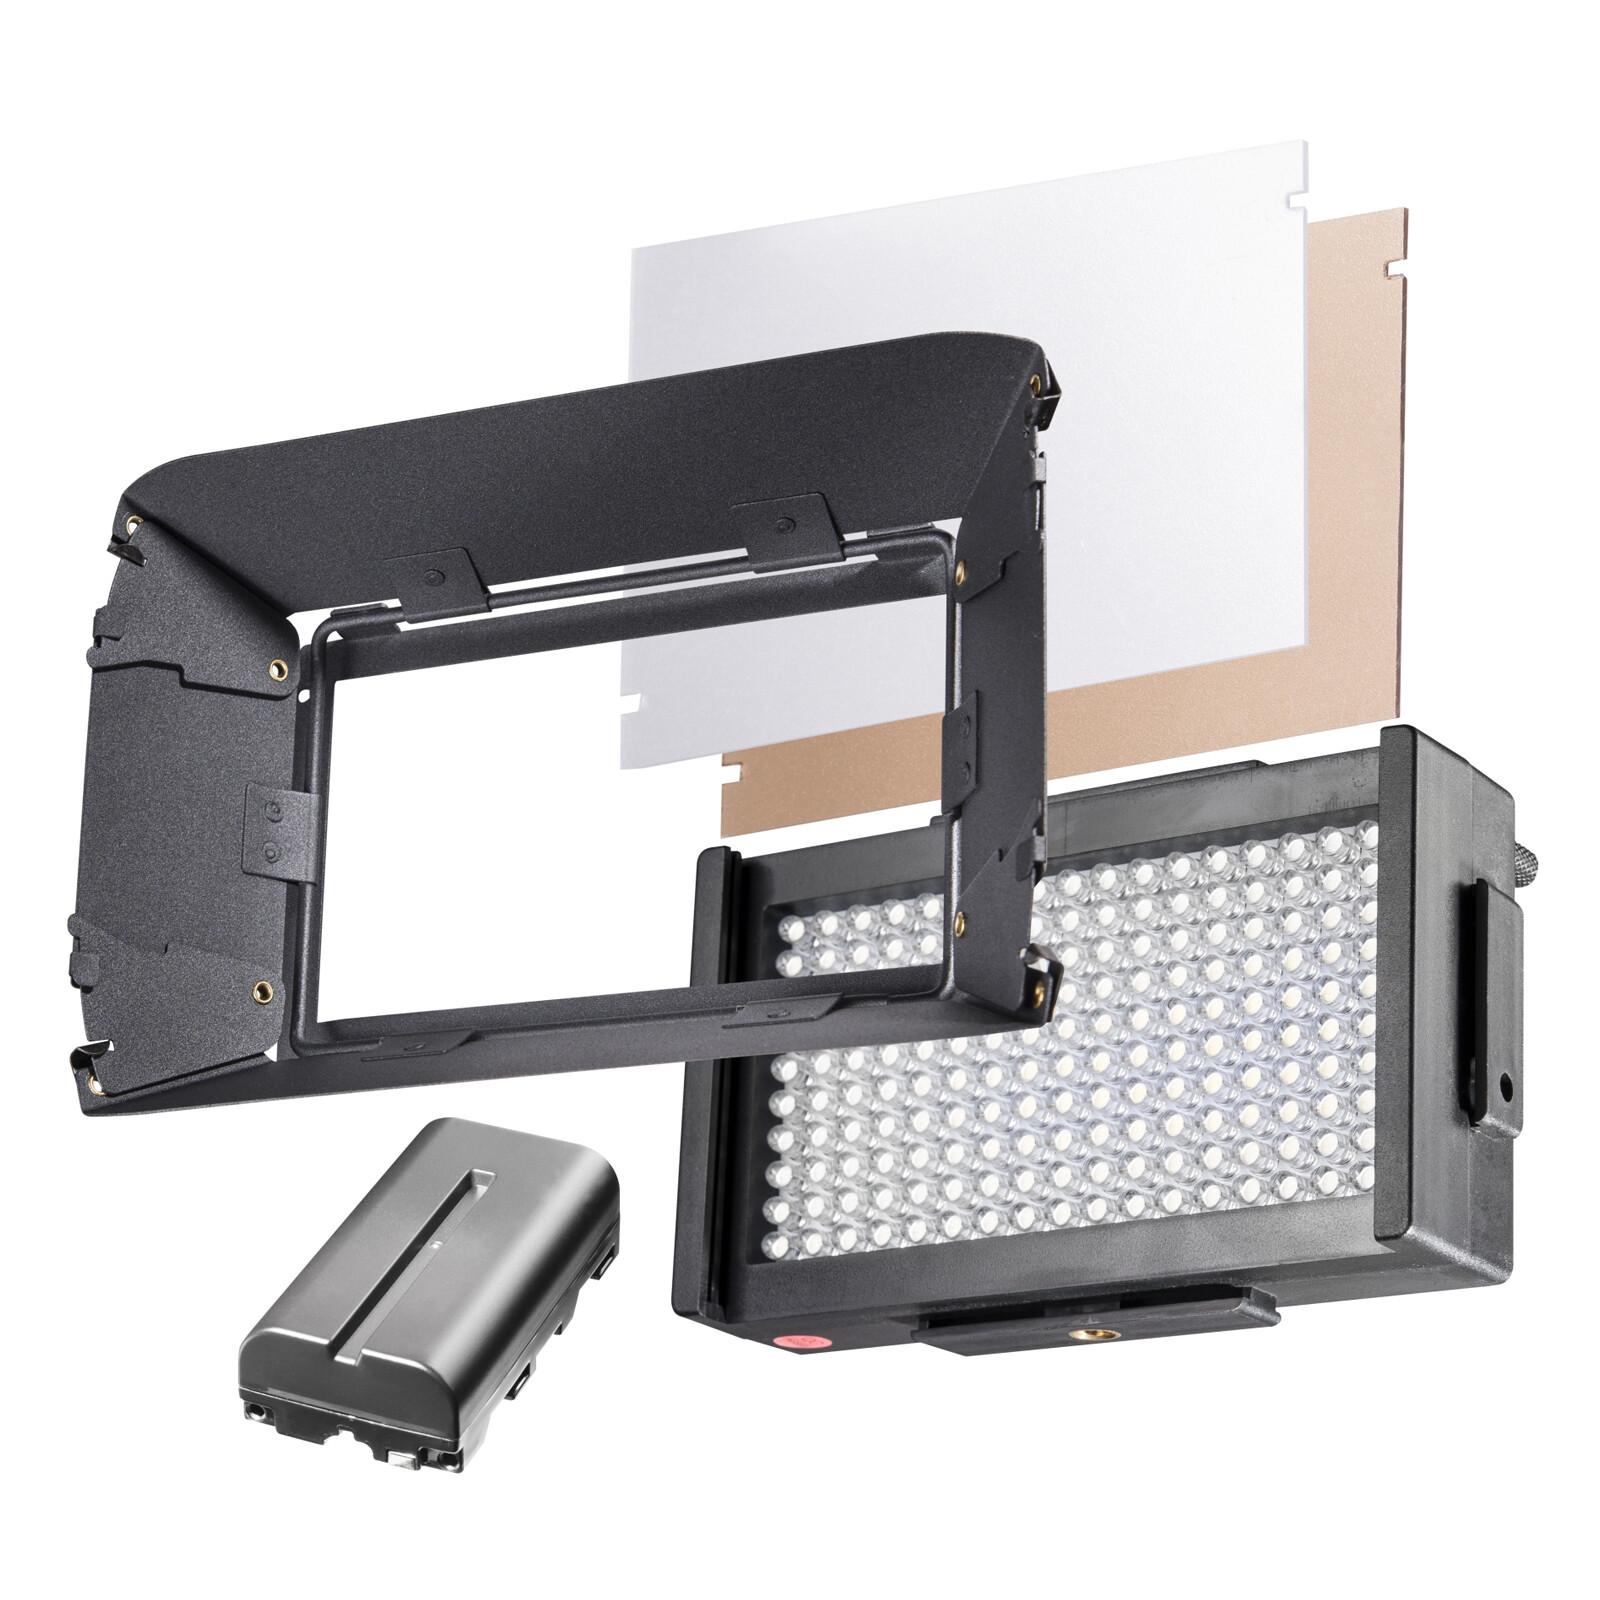 walimex pro Foto/Video LED quare 170 Bi